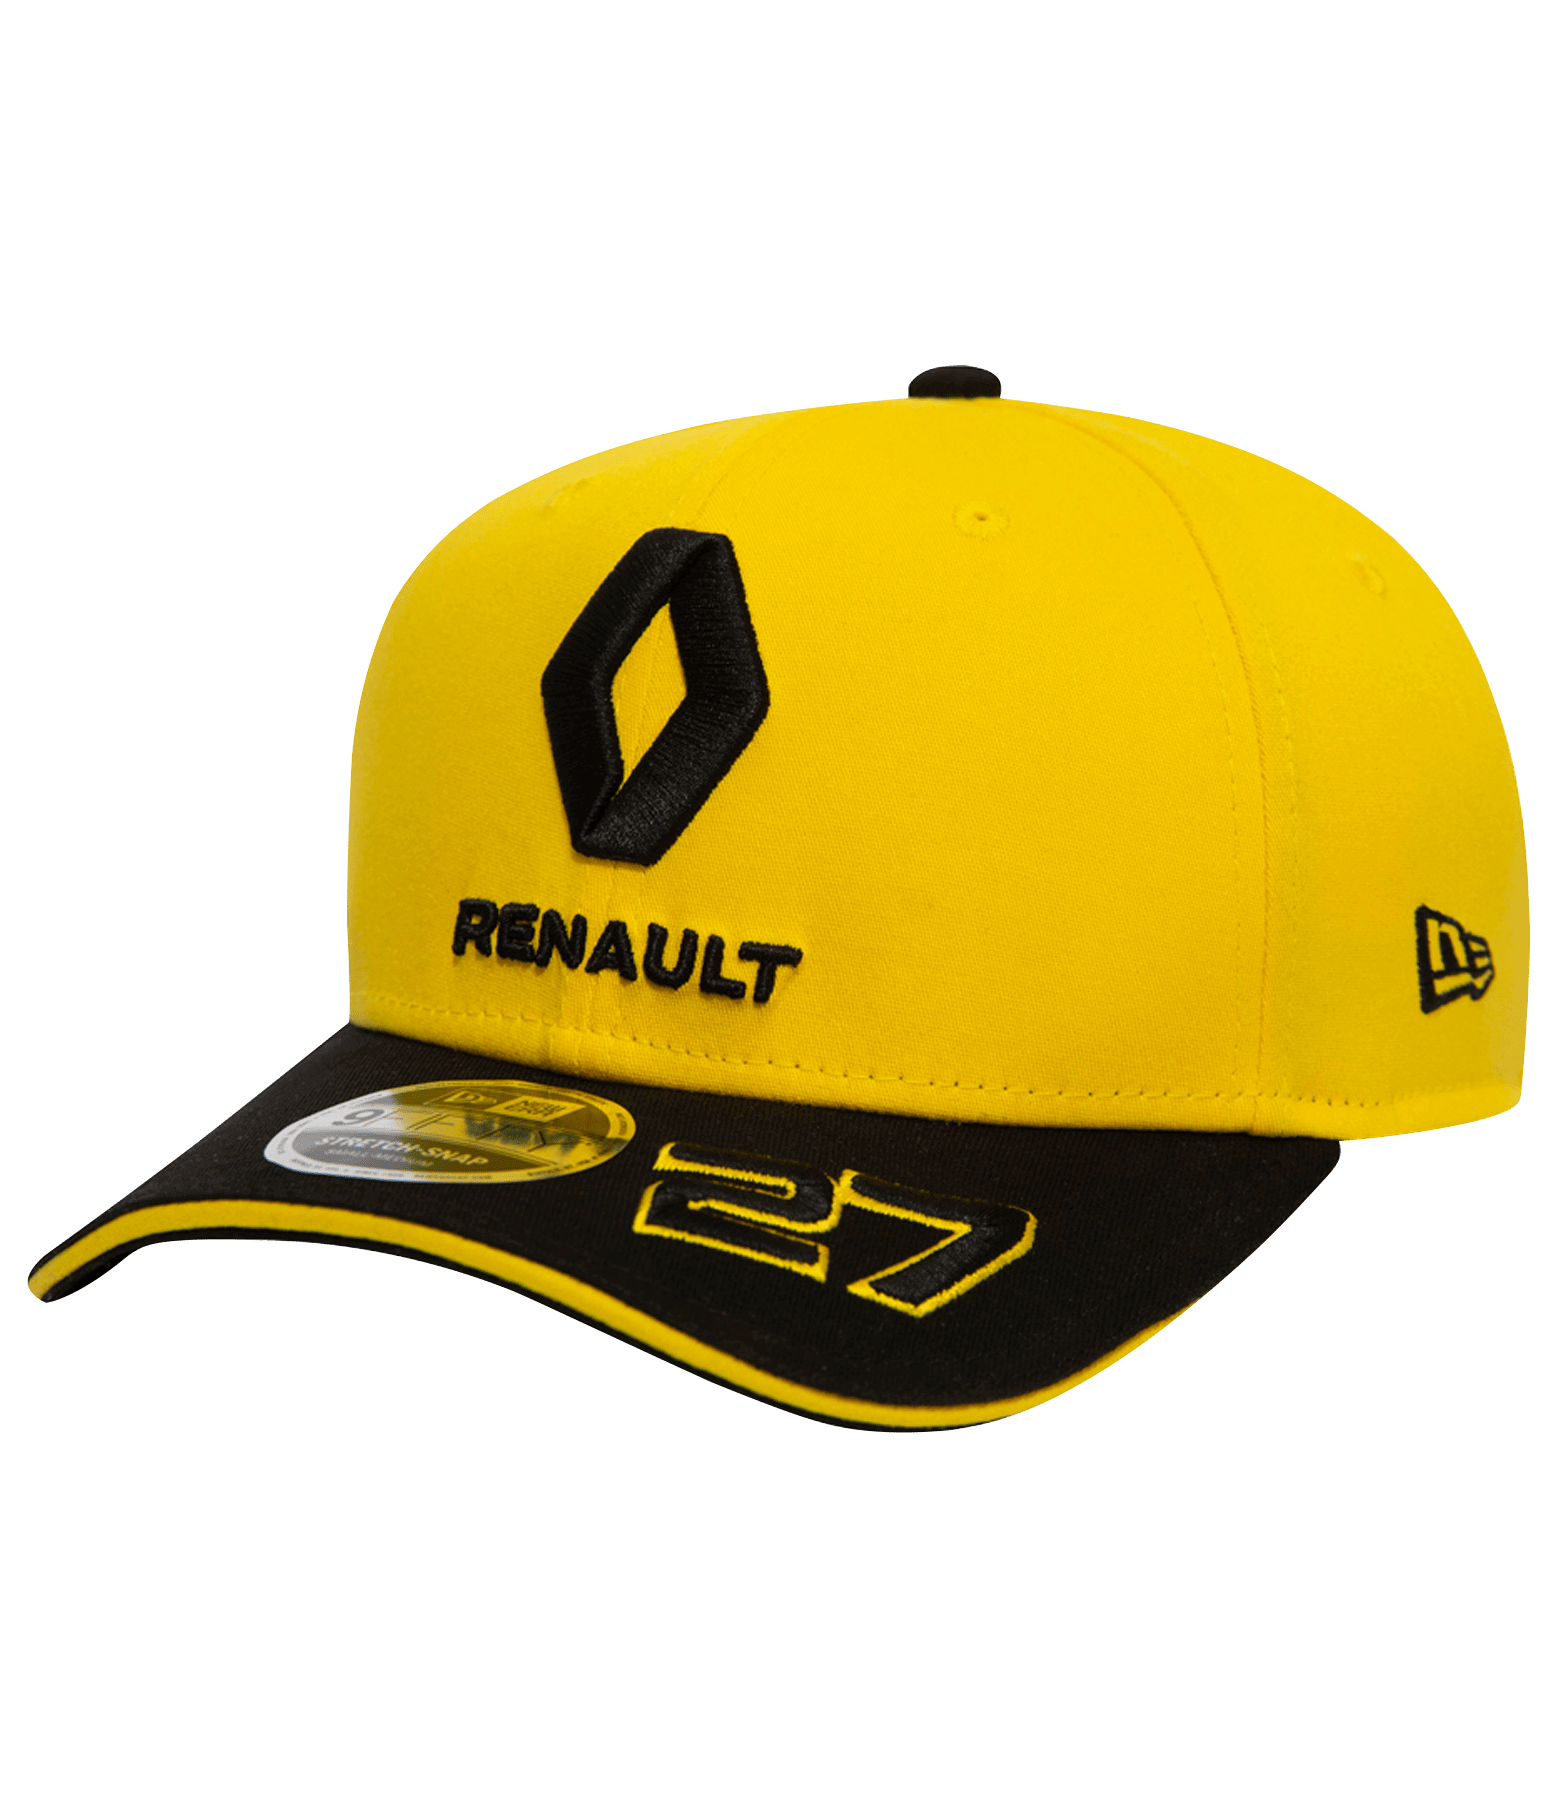 Nico Hülkenberg 2019 official cap - yellow